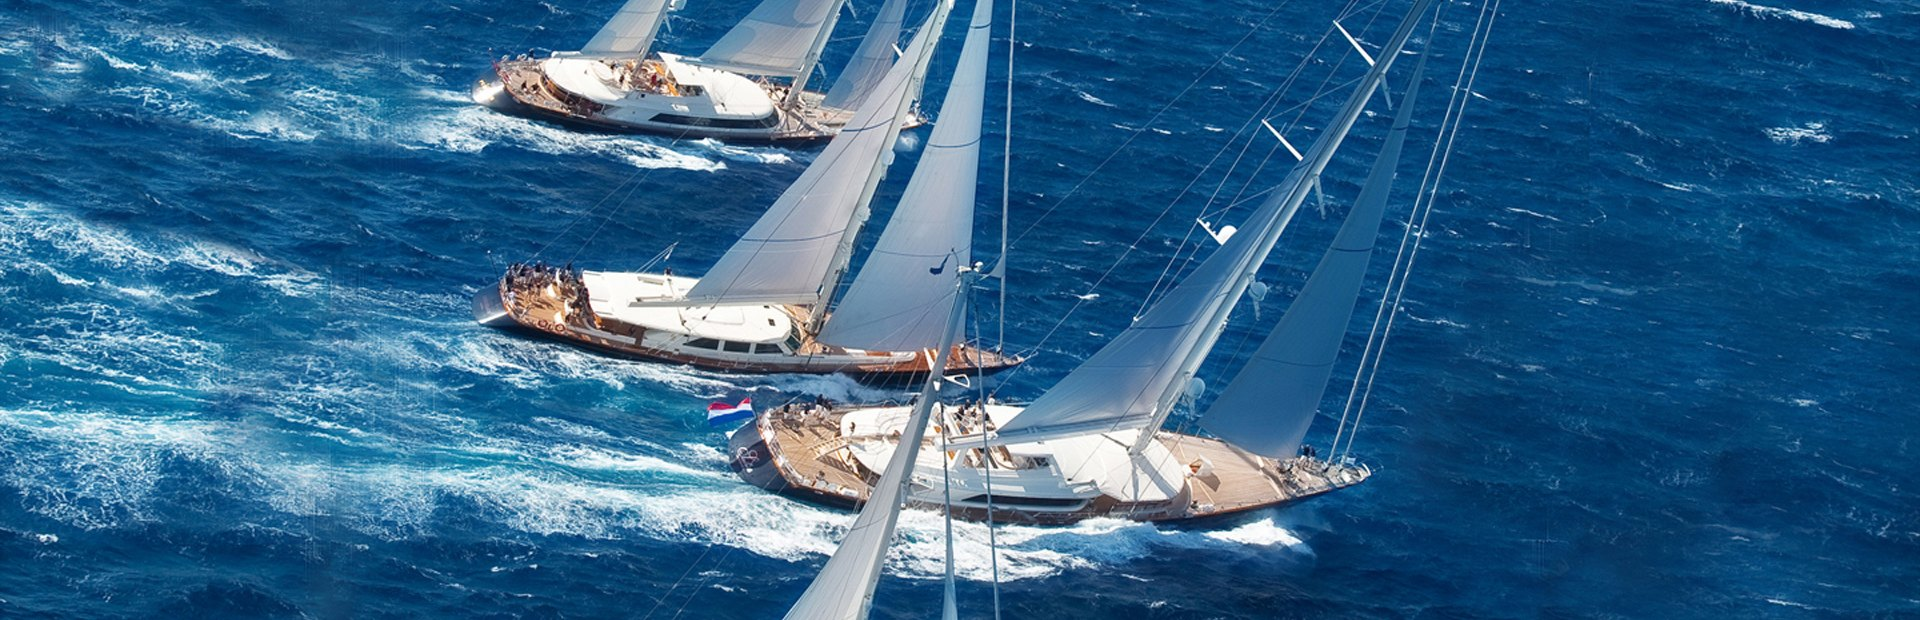 Perini Navi built superyachts racing in Perini Navi Cup in Italy